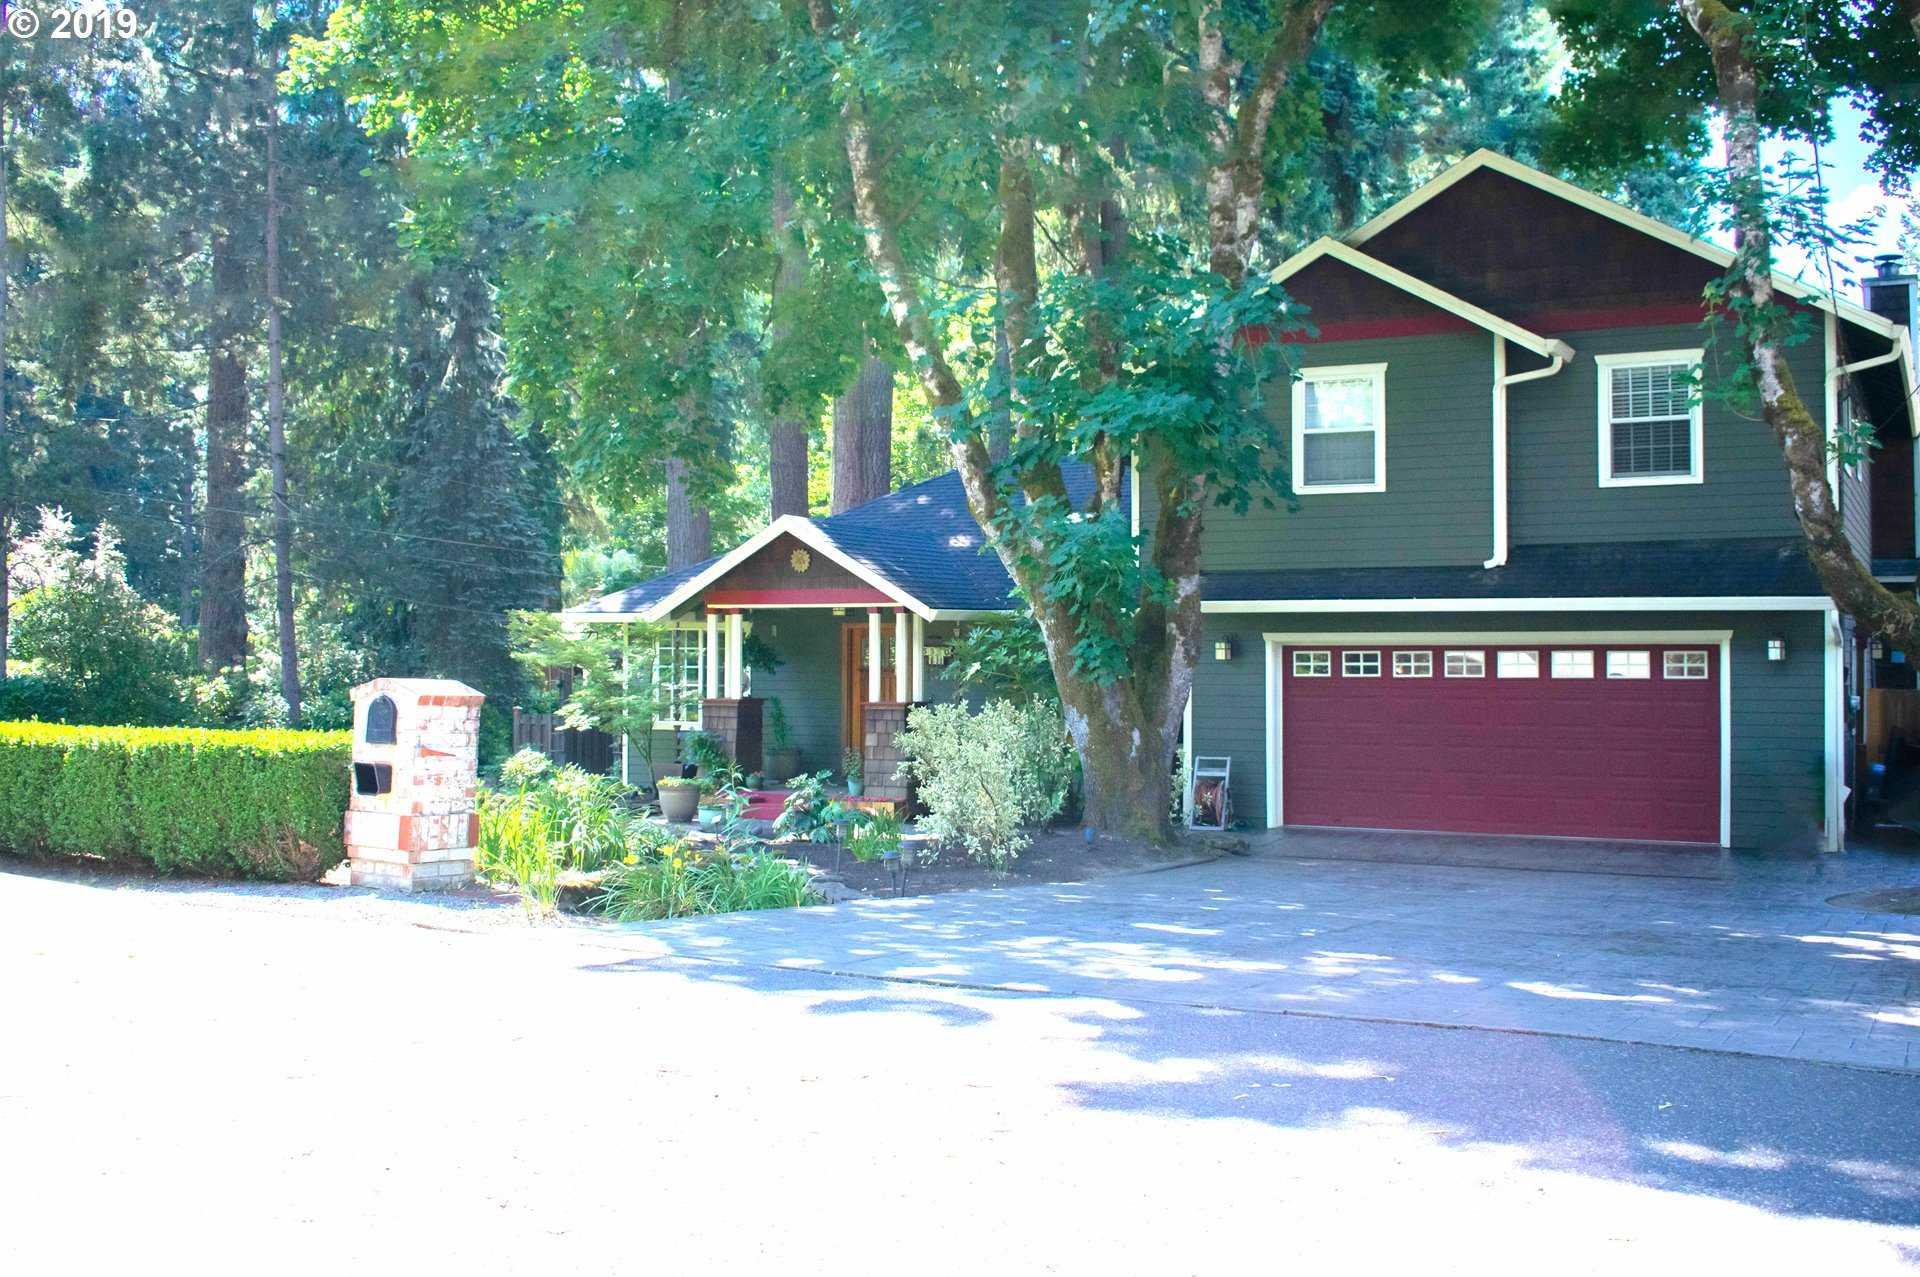 $868,800 - 4Br/3Ba -  for Sale in Lake Oswego